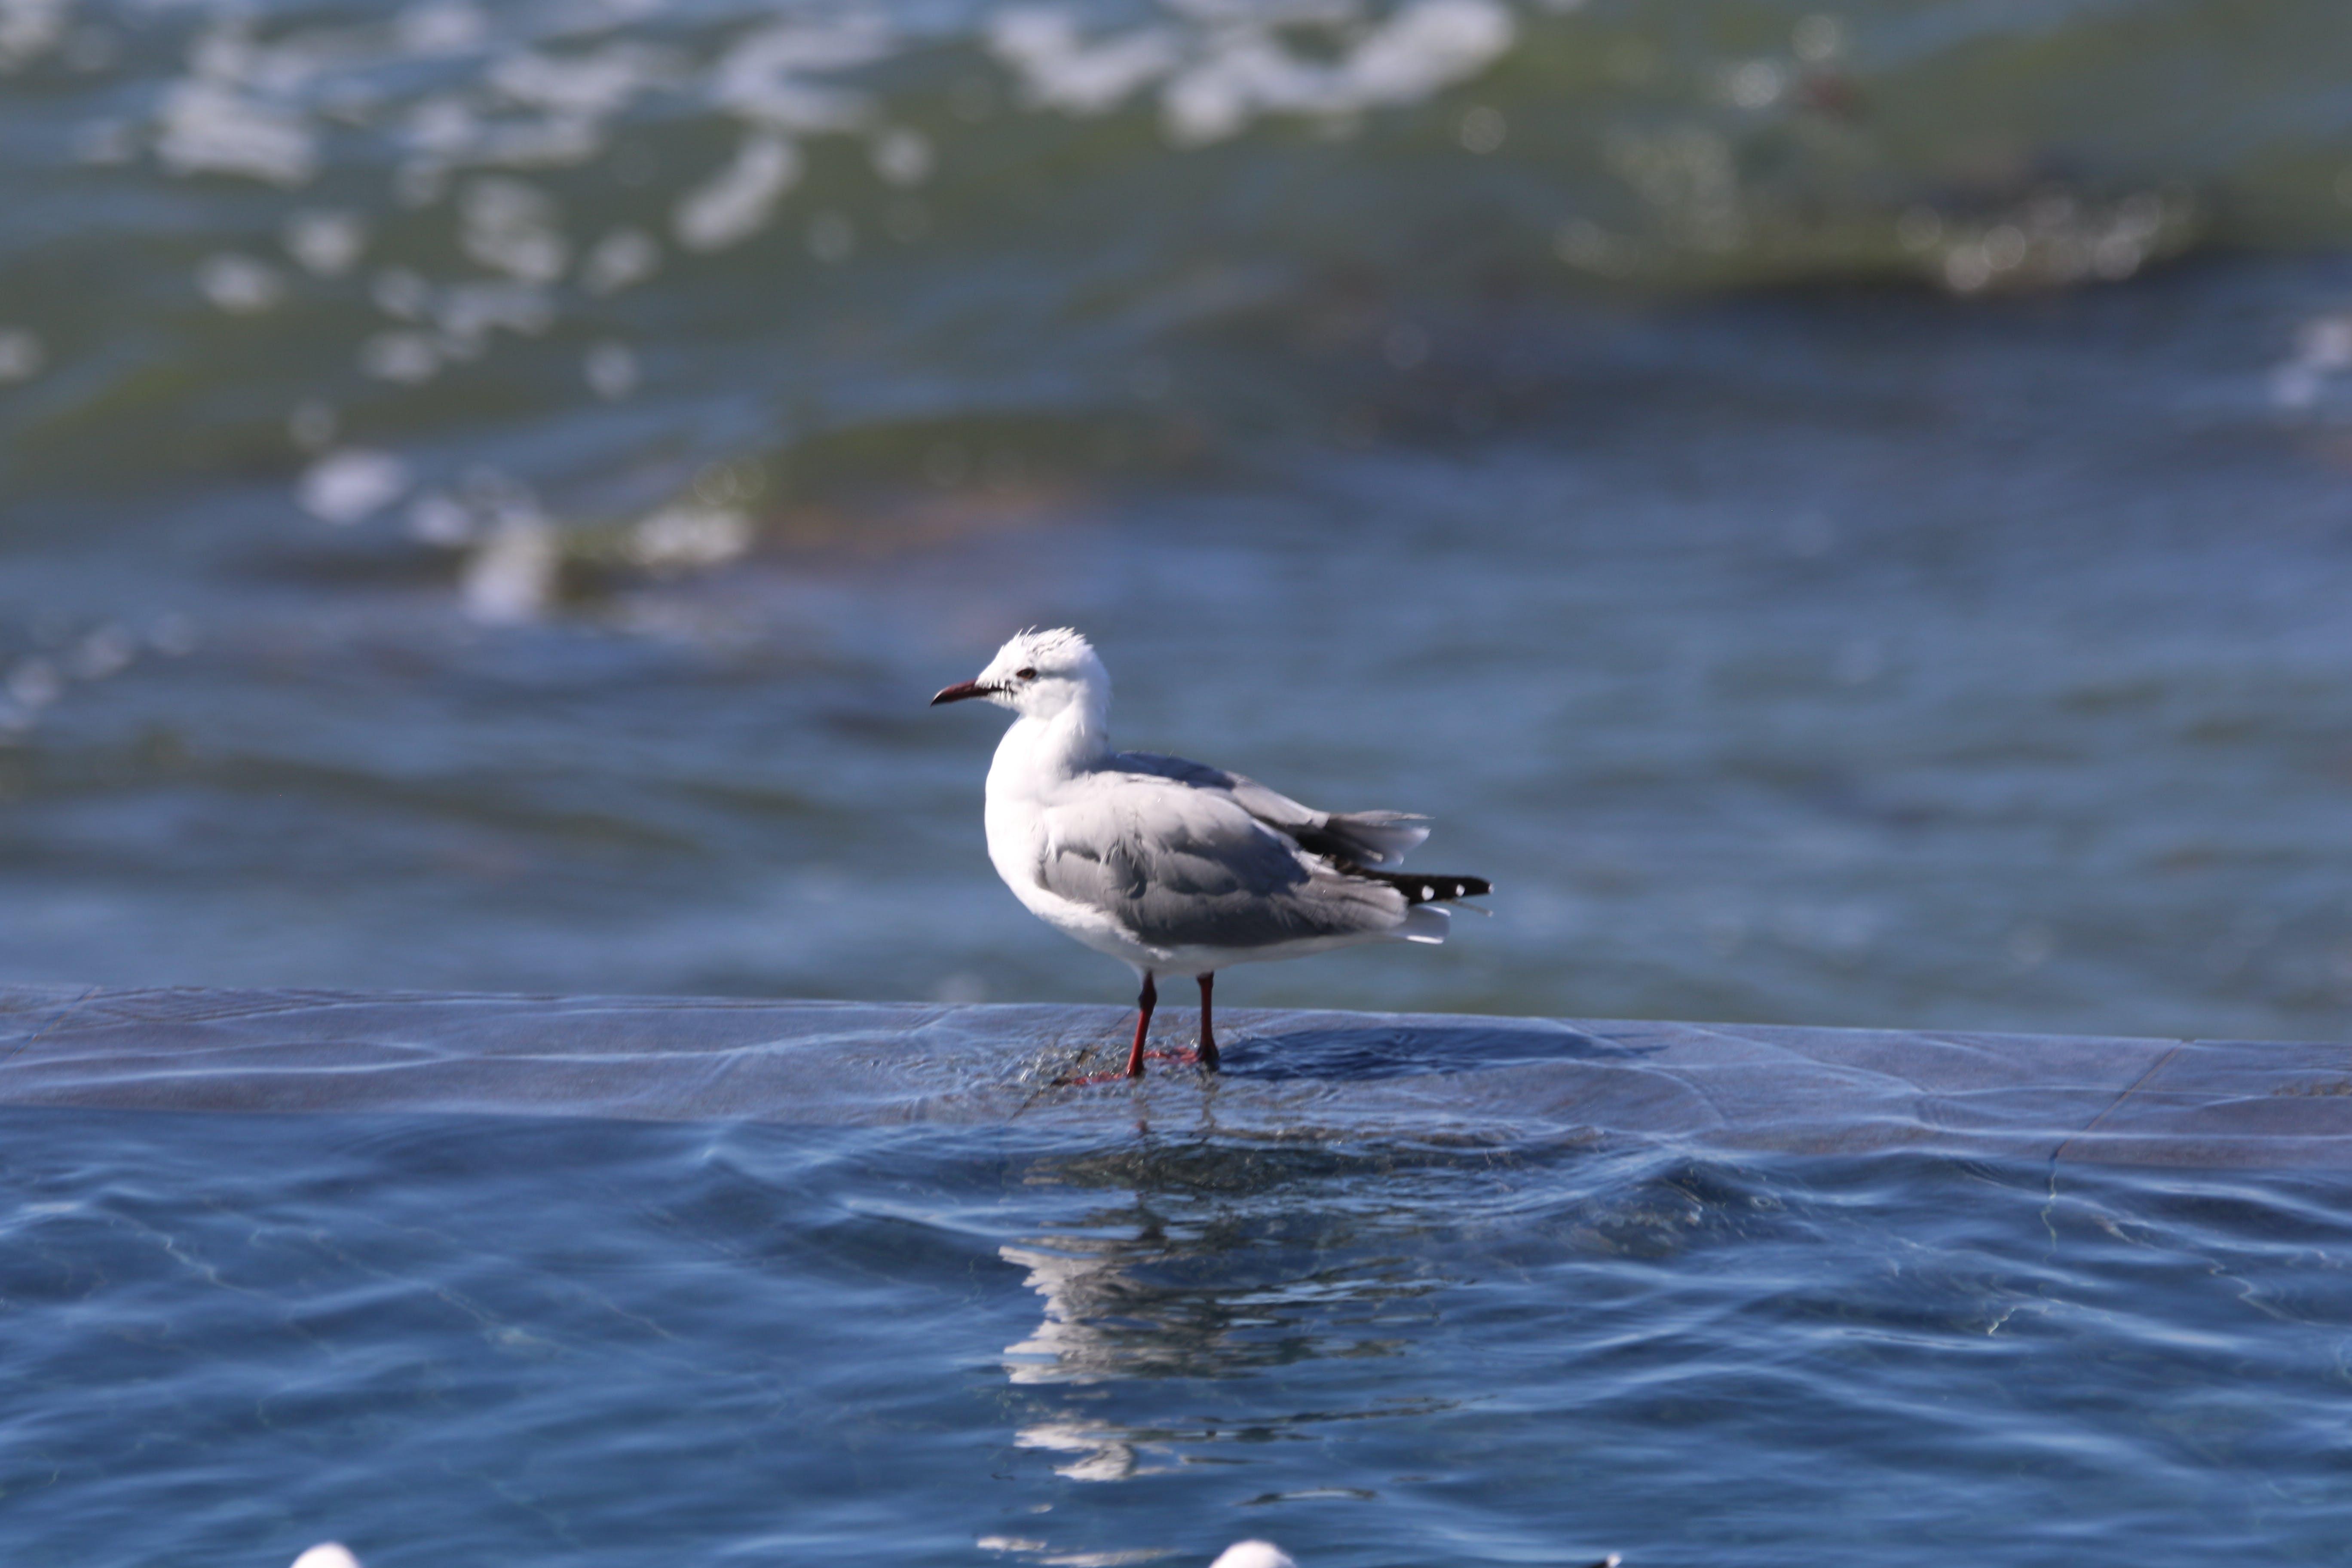 Free stock photo of nature, bird, animal, swimming pool